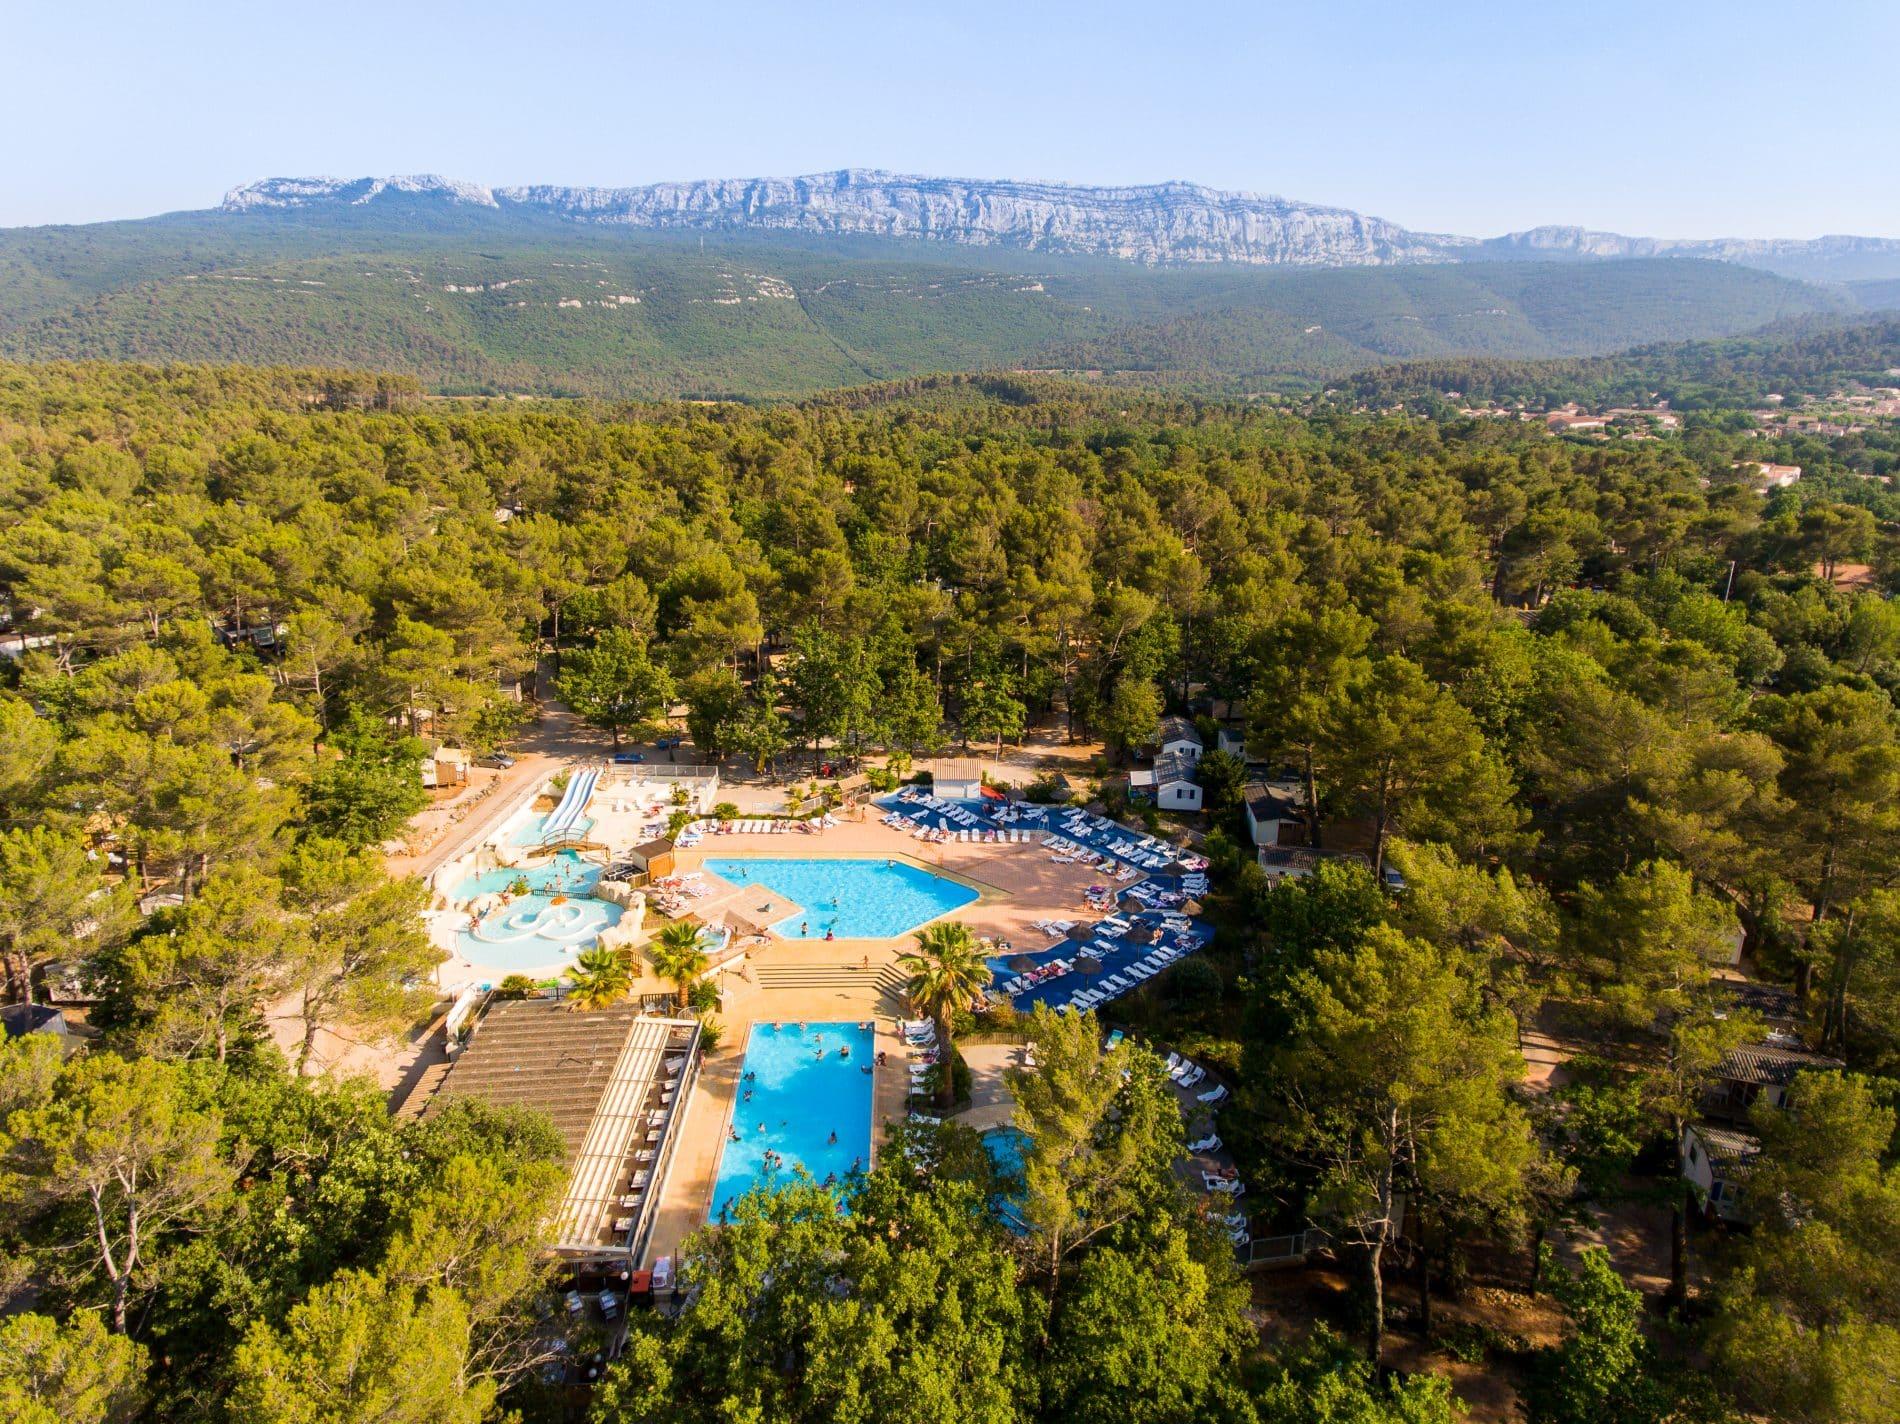 Camping   Massif de la Sainte-Baume  Provence   mademoiselle-voyage